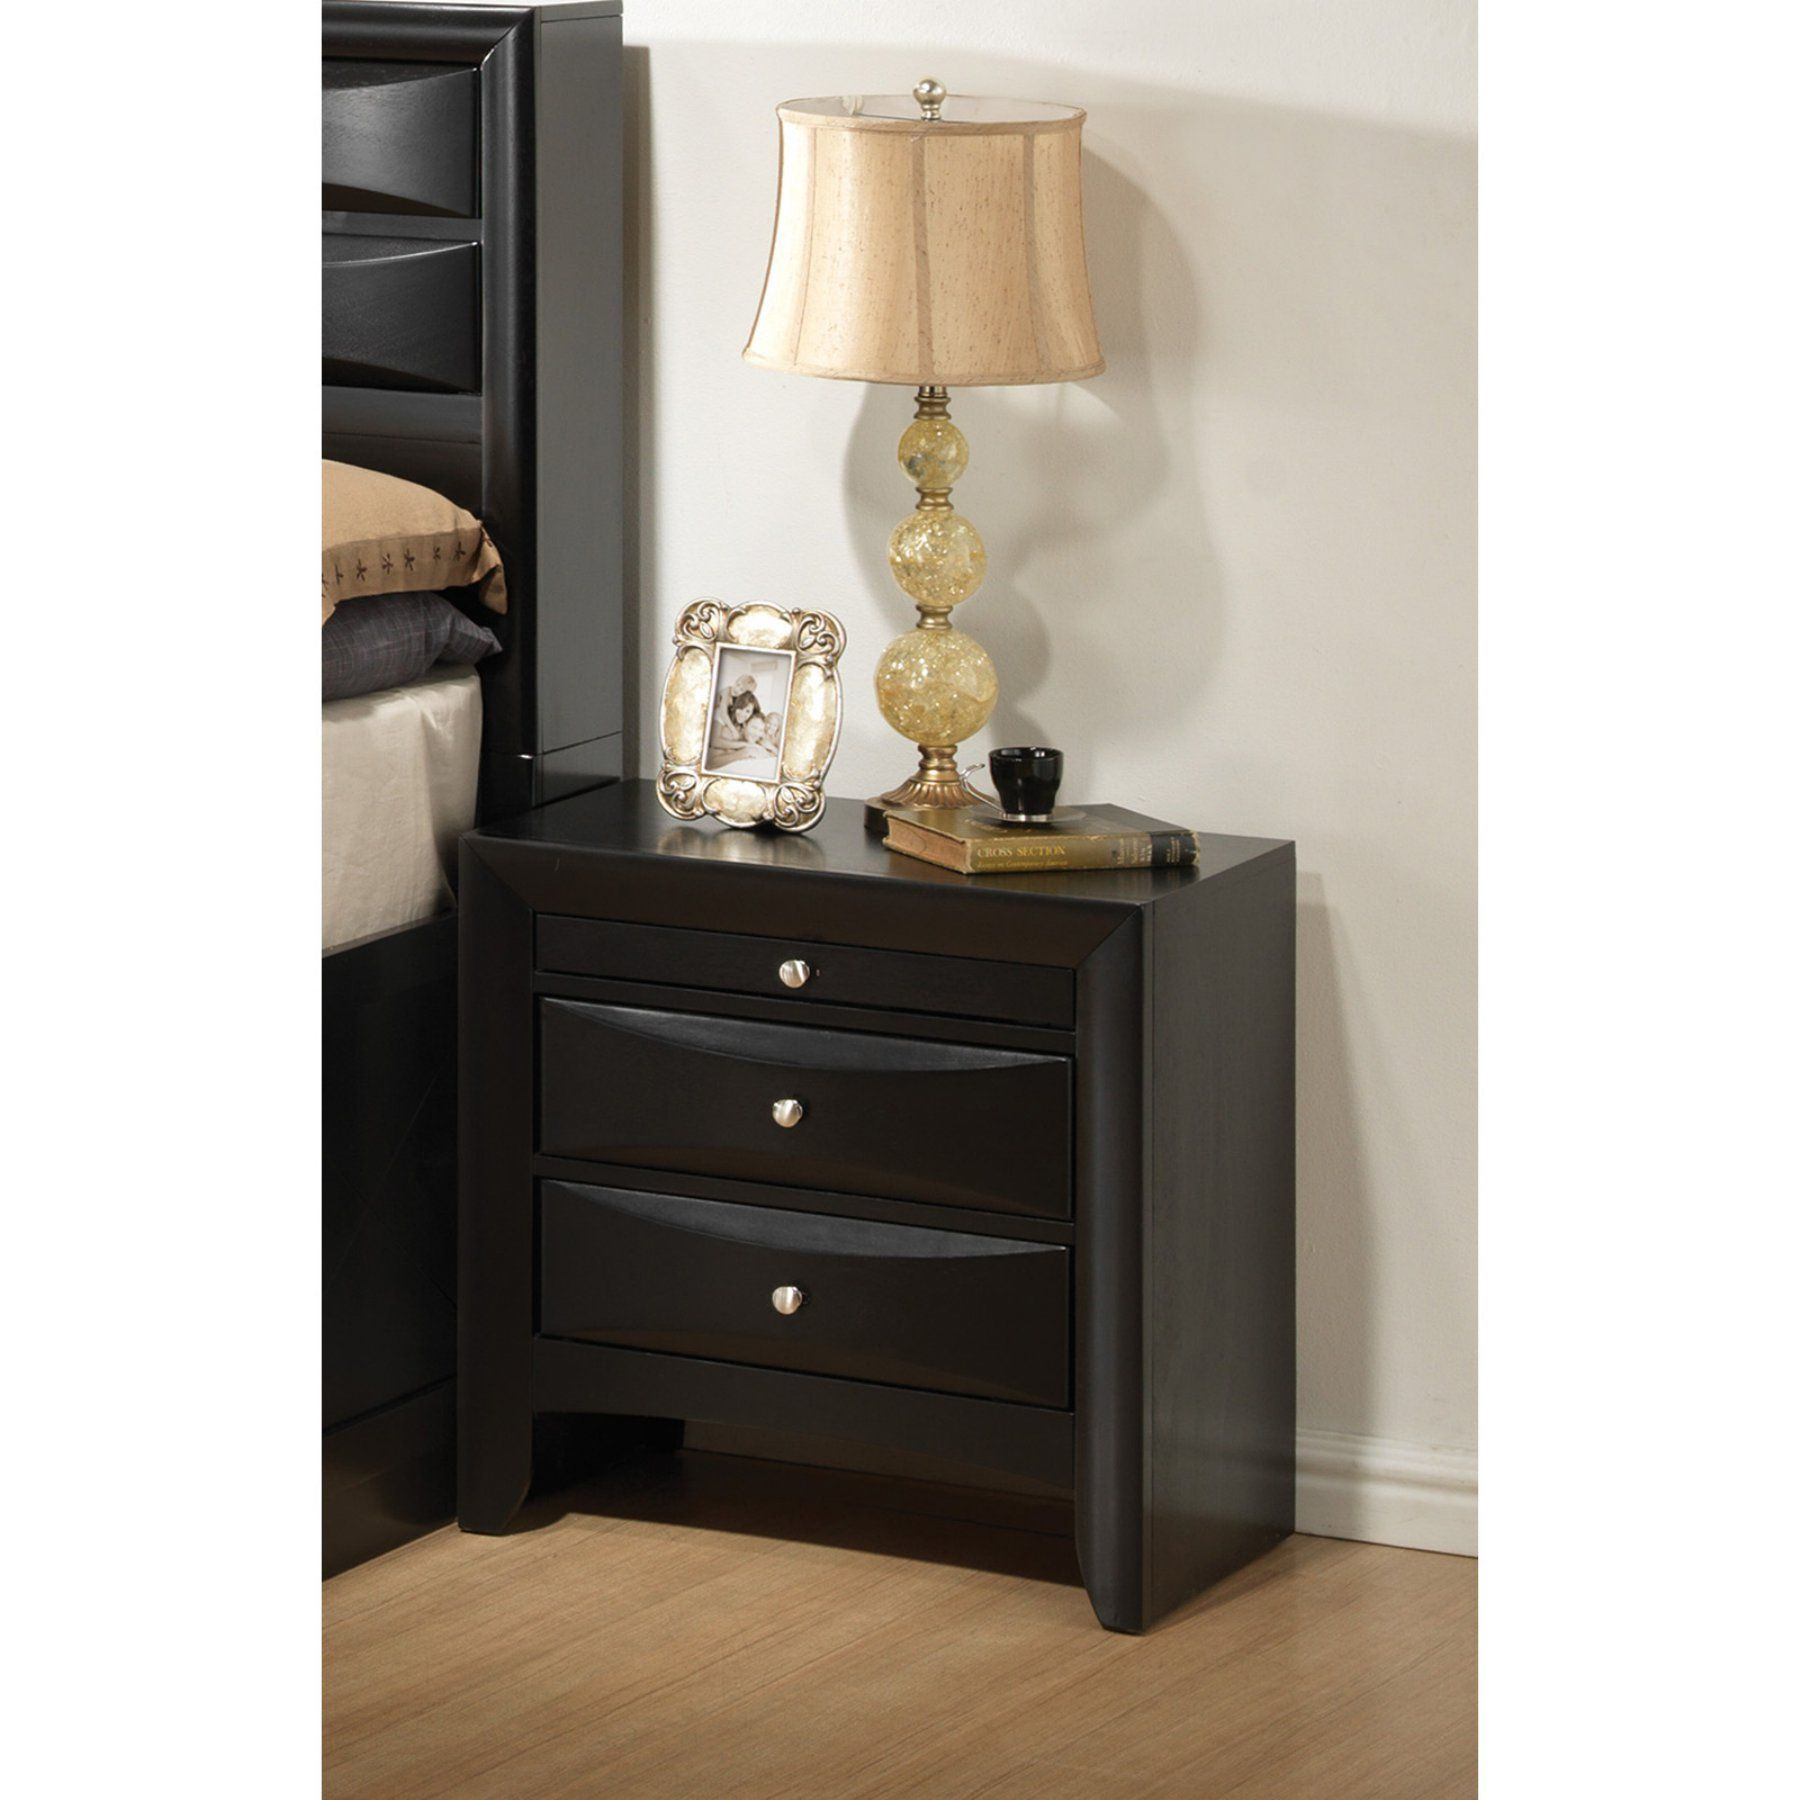 Coaster furniture briana drawer nightstand coasters and